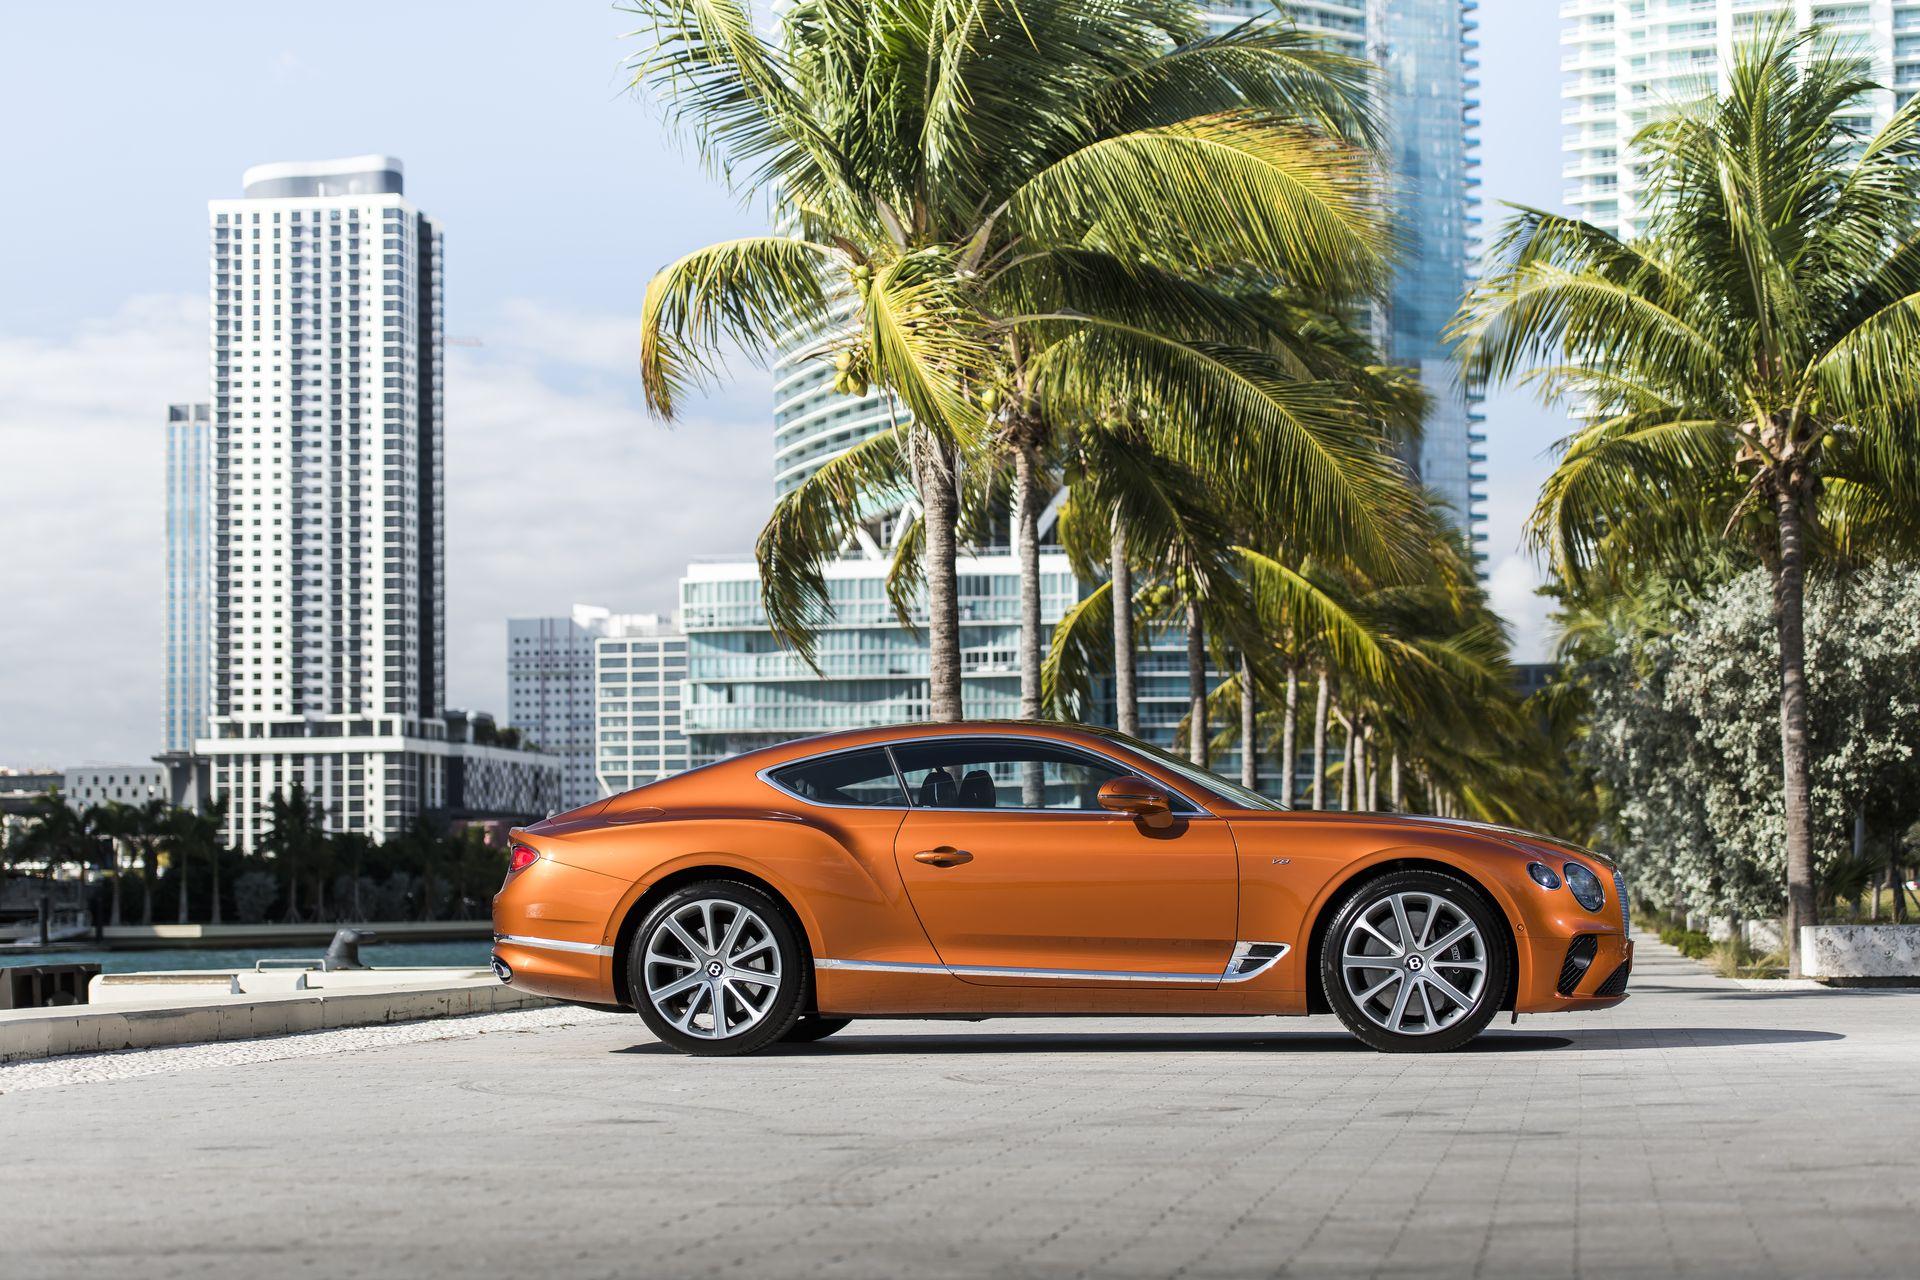 Bentley Continental Gt V8 2019 8